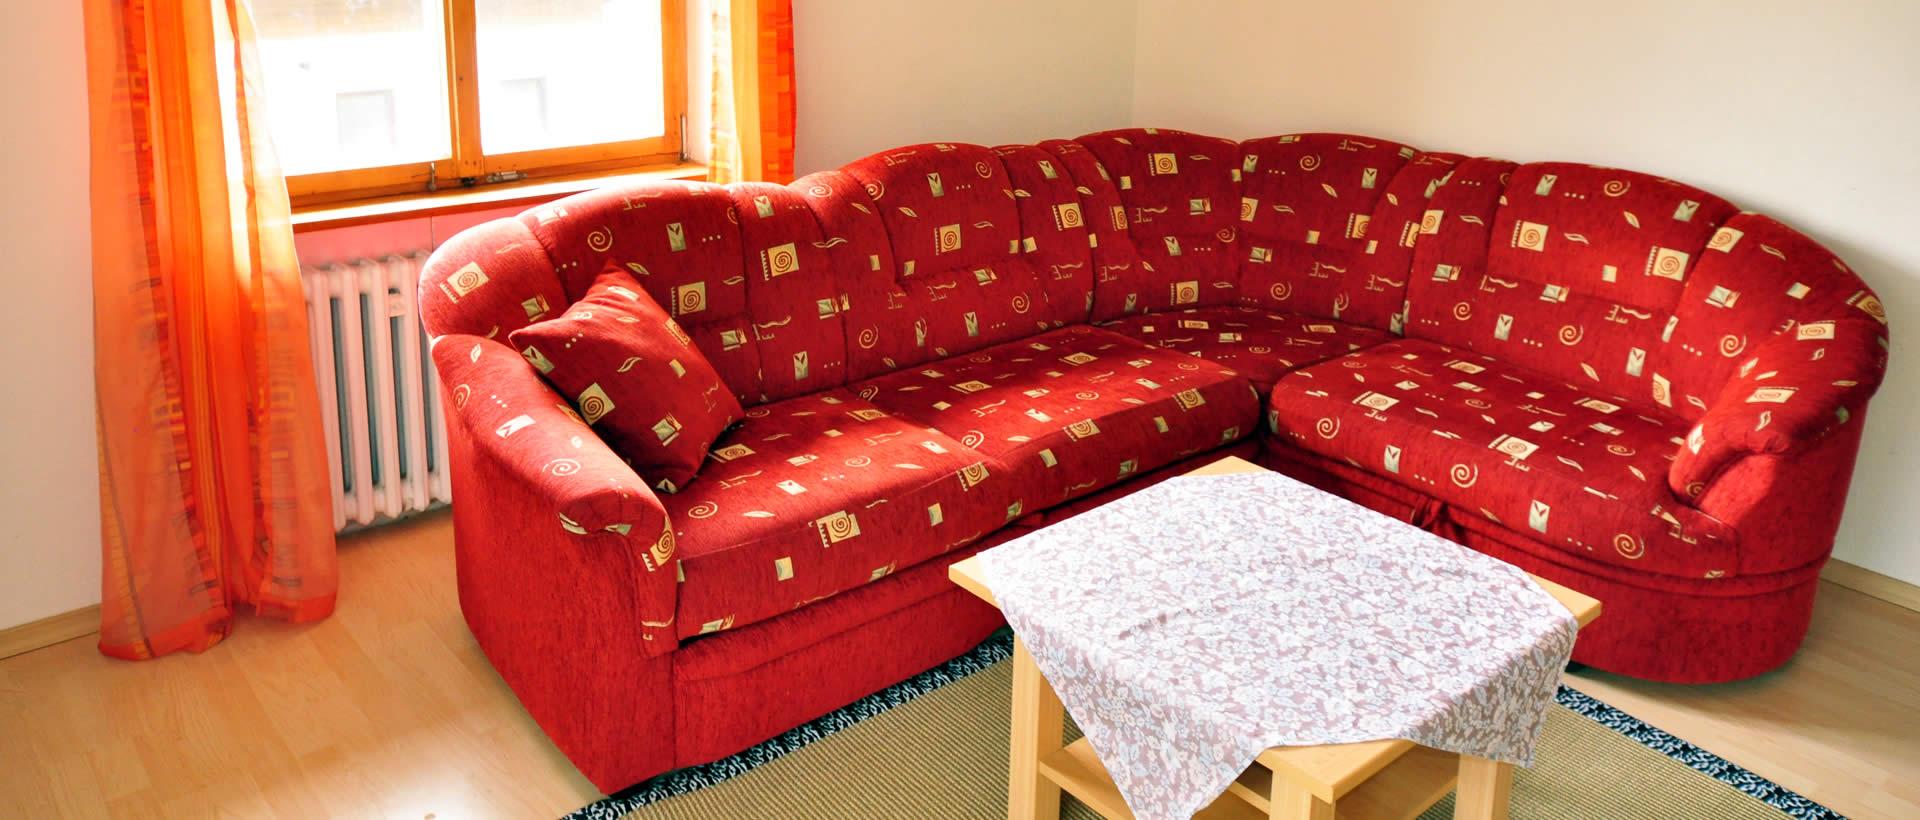 sofa-slider